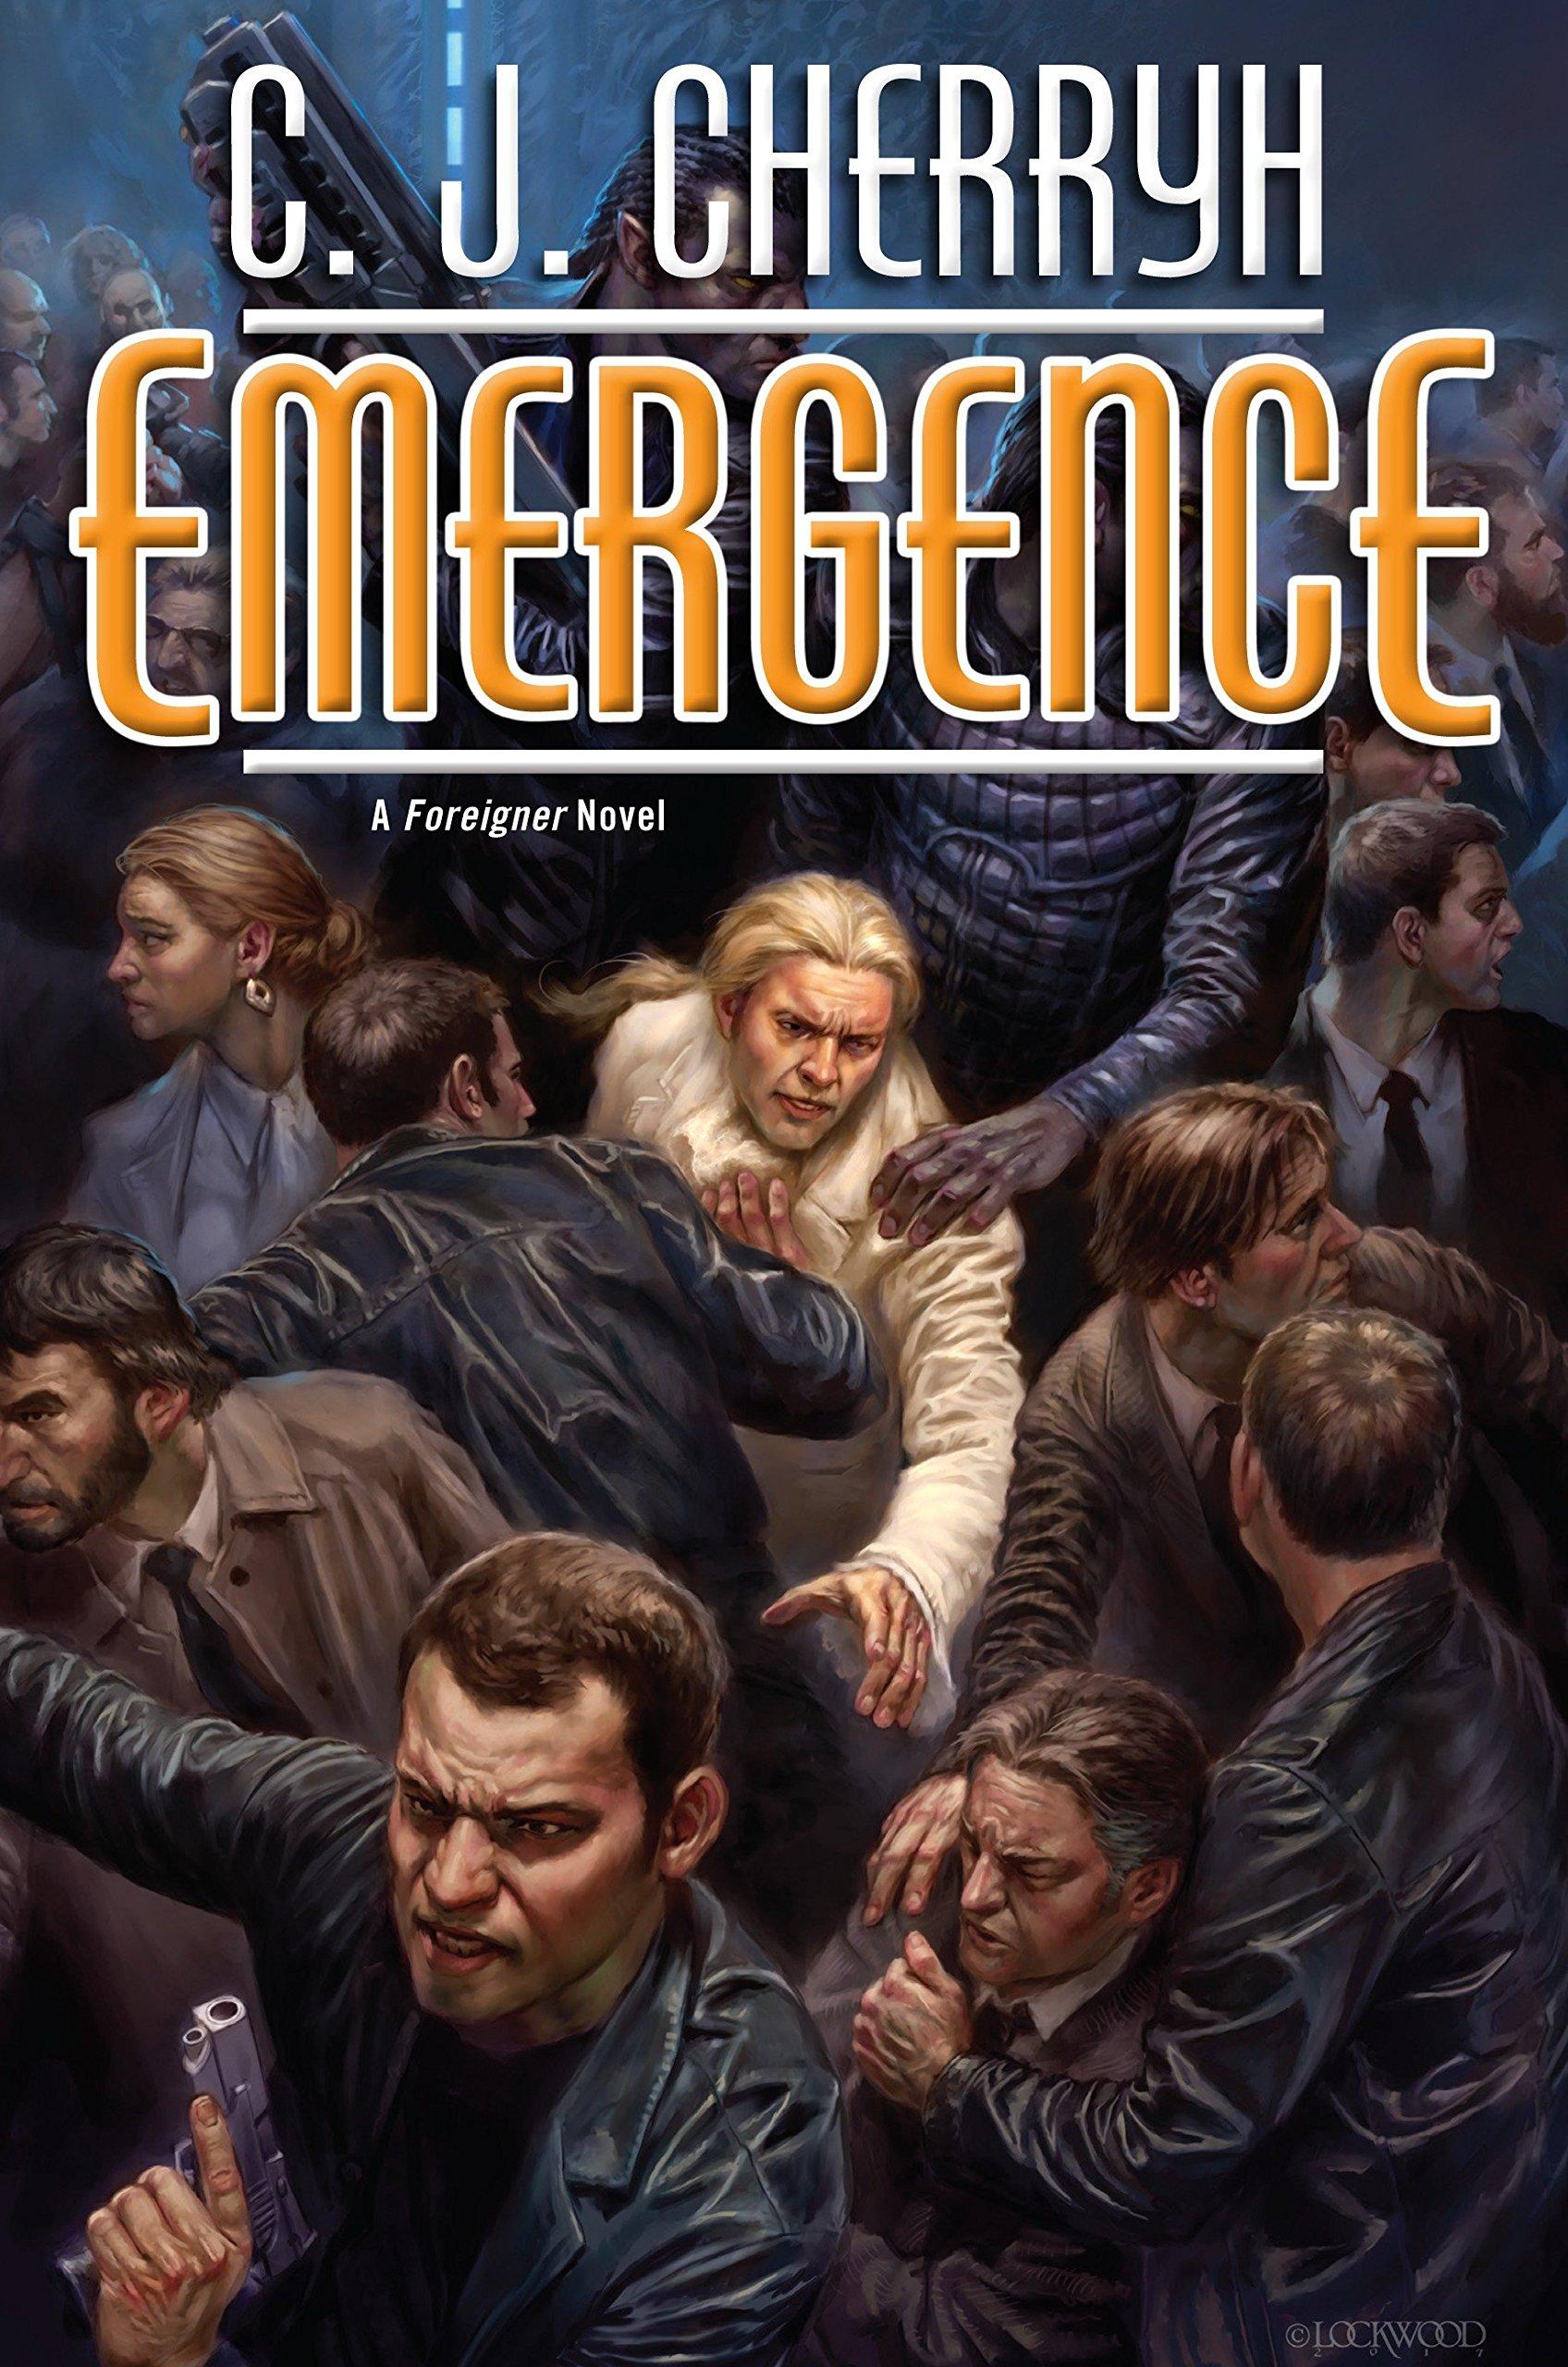 Cherryh, EMERGENCE, US cover.jpg